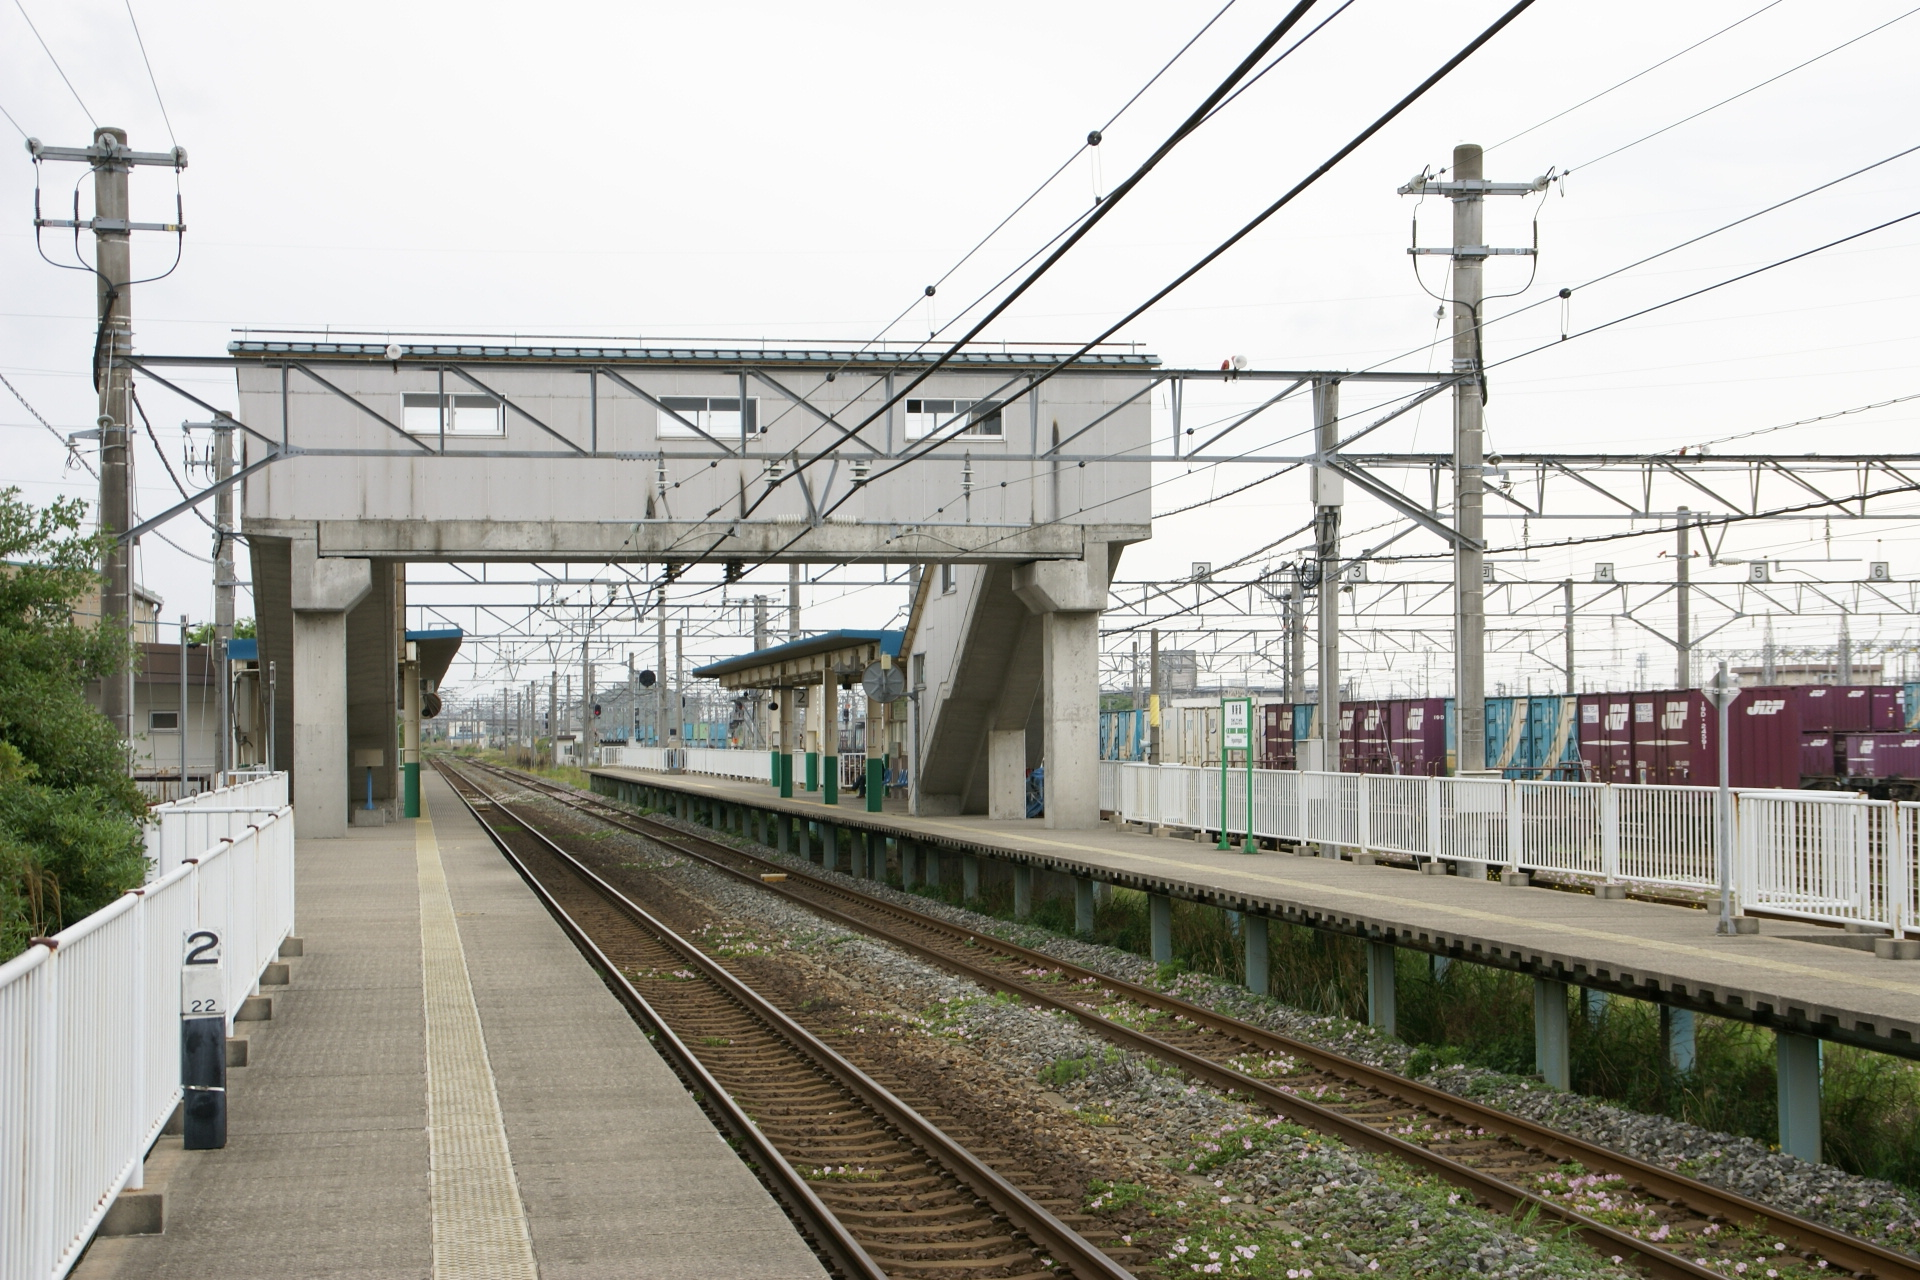 https://upload.wikimedia.org/wikipedia/commons/2/26/Higashi-Niigata_20080526_%283%29.JPG